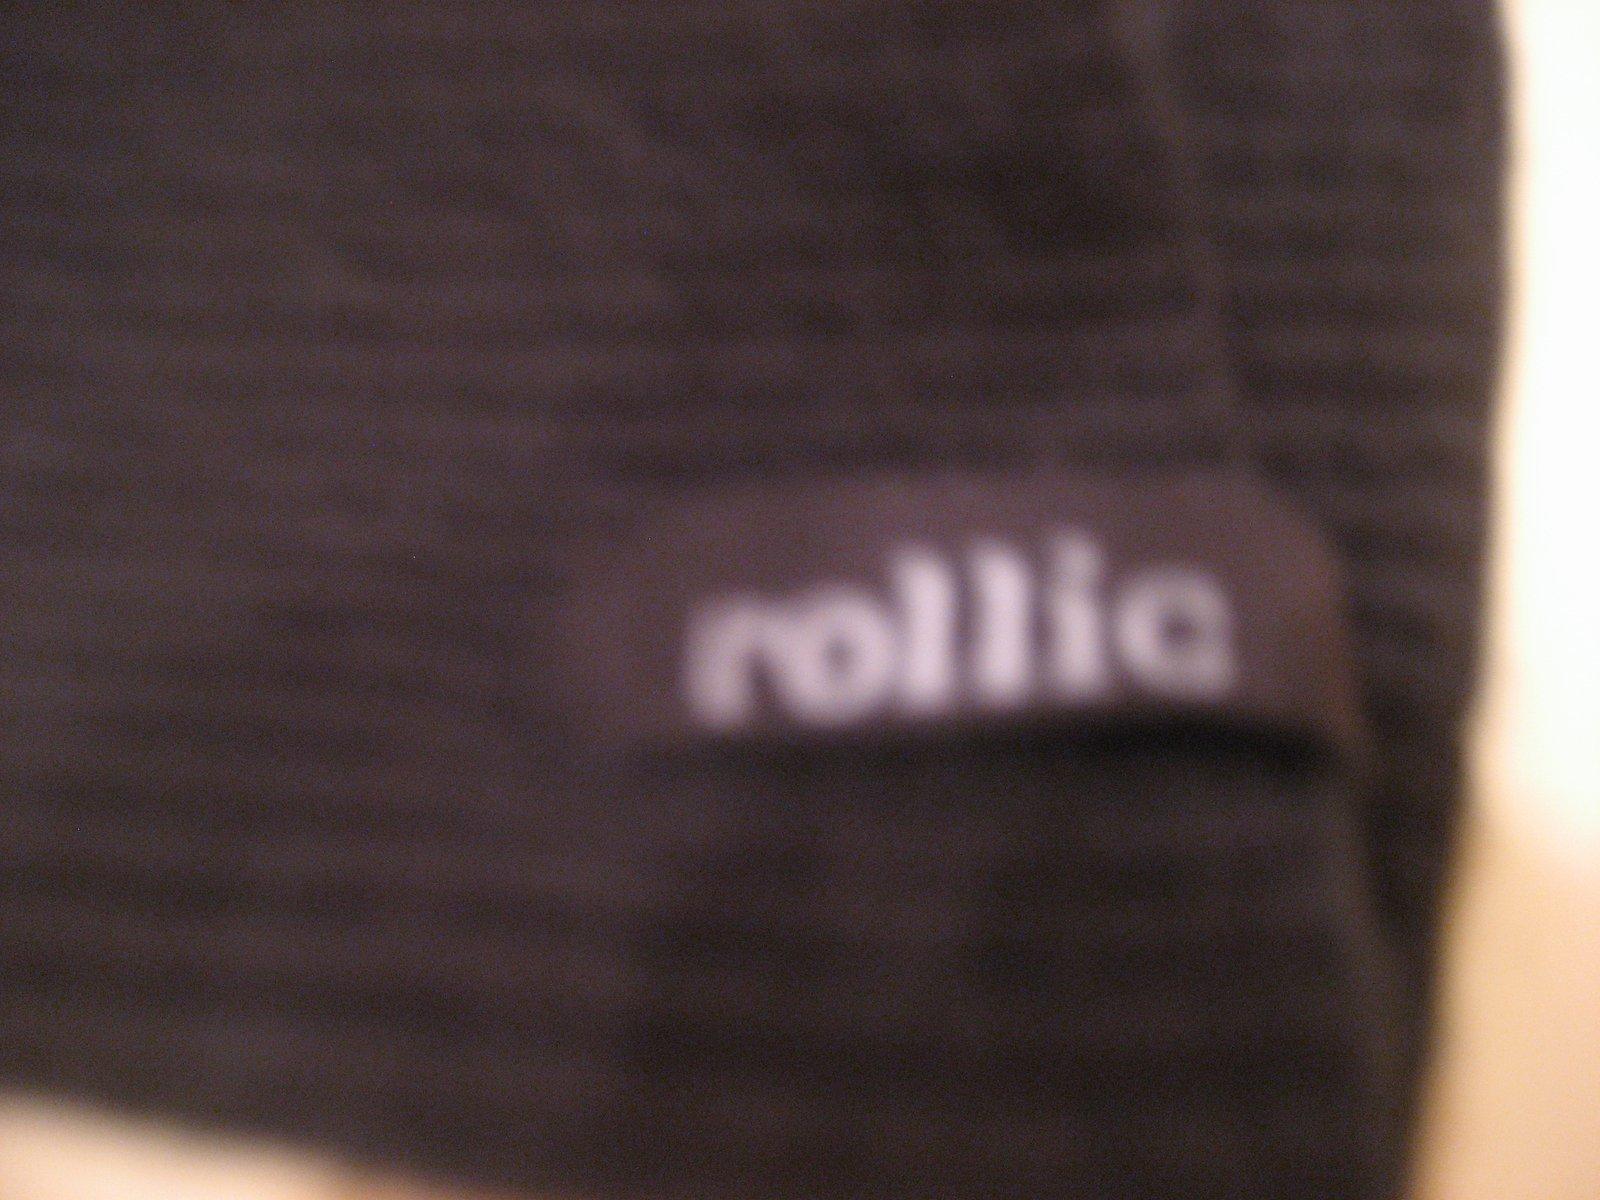 Fs rollic 2